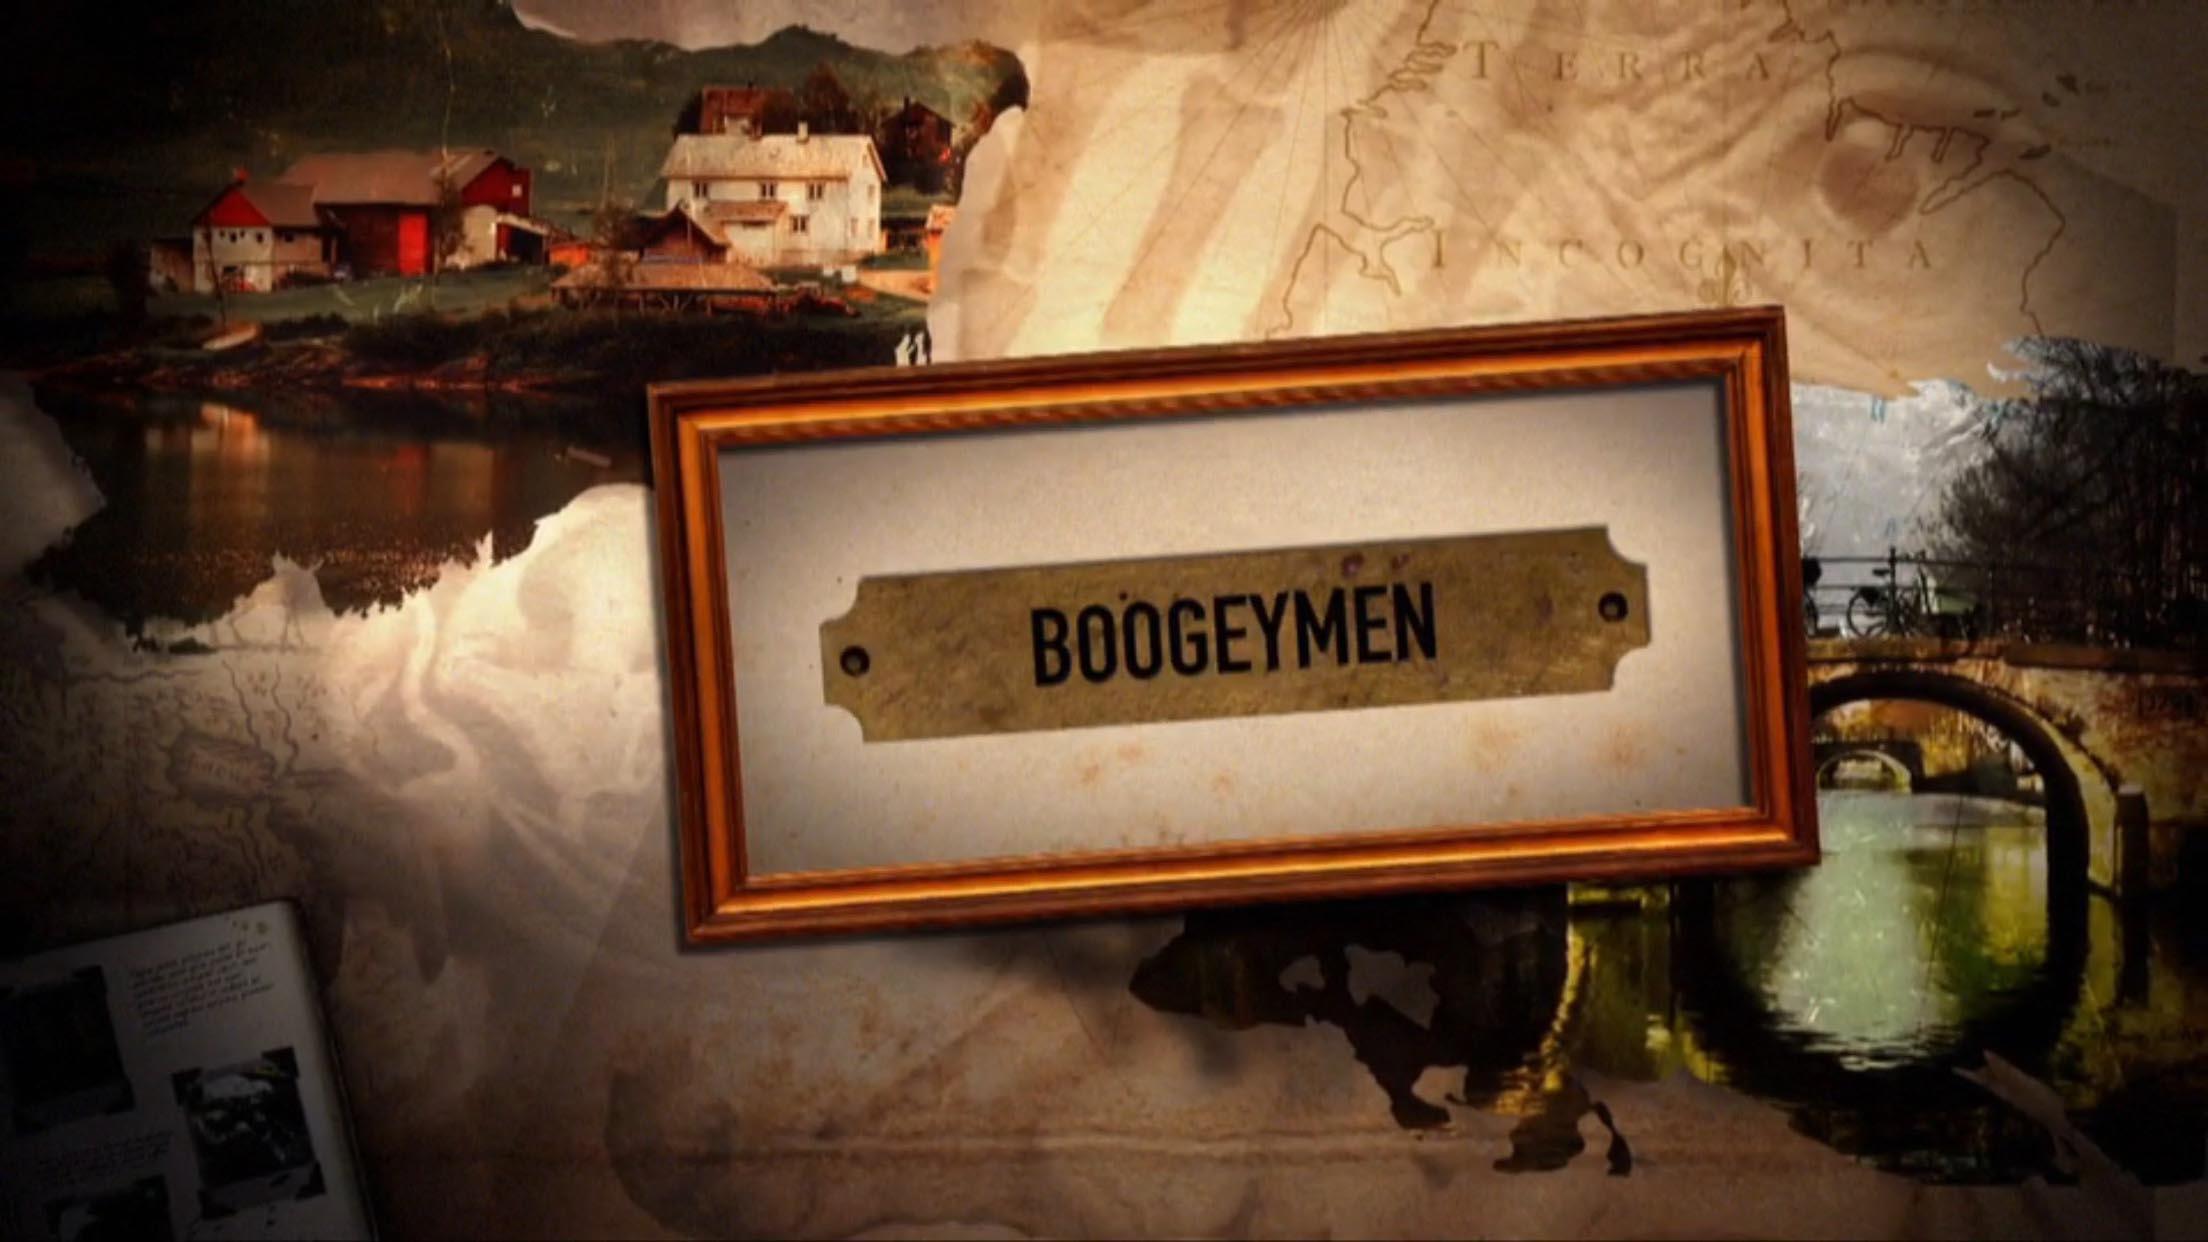 Watch NORMIE on BOOGEYMEN!